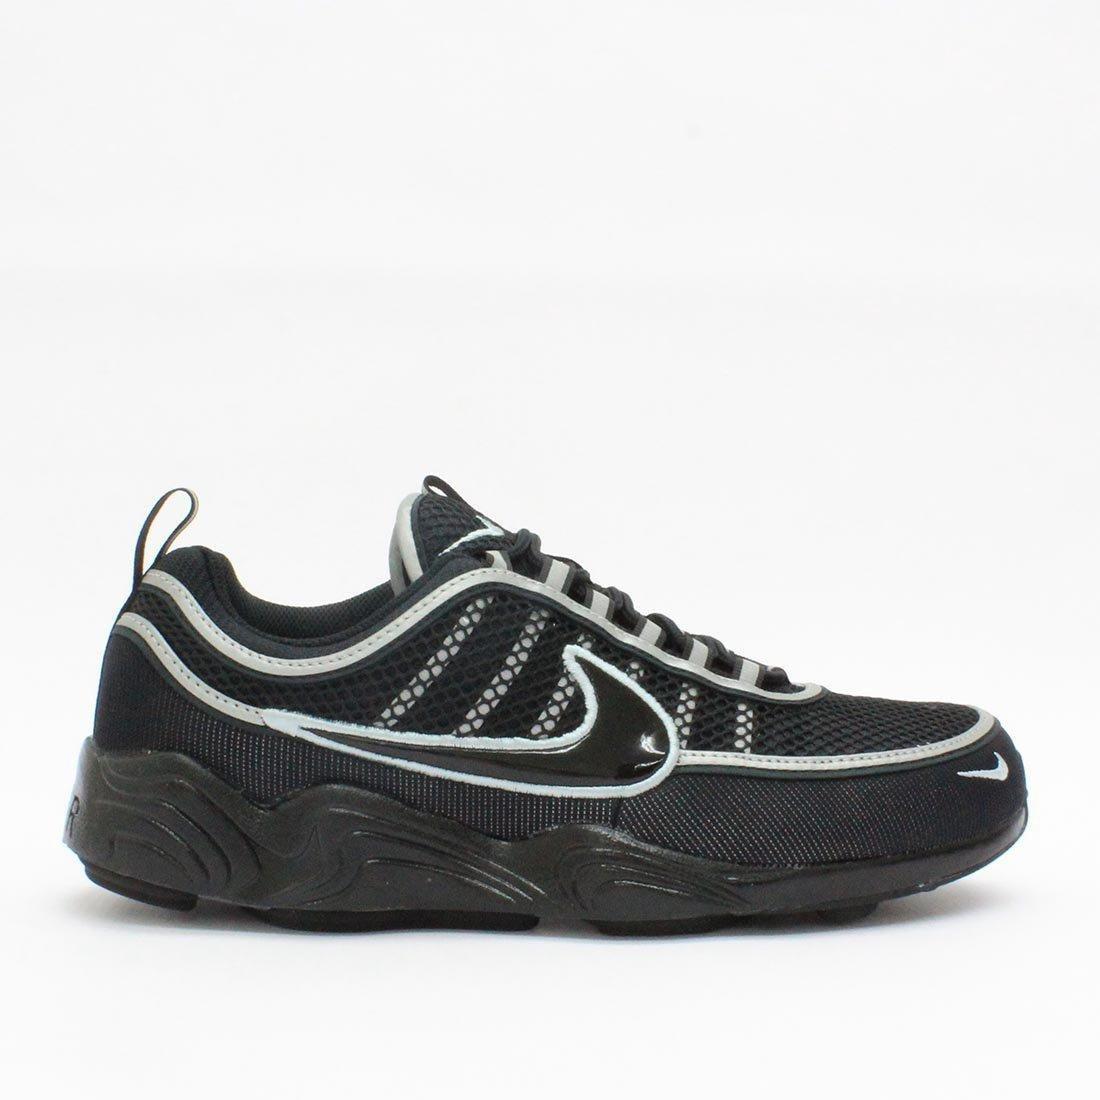 innovative design c5f39 cfa0c Lyst - Nike Trainers Nike Air Zoom Spiridon 16 Black 926955 008 in ...